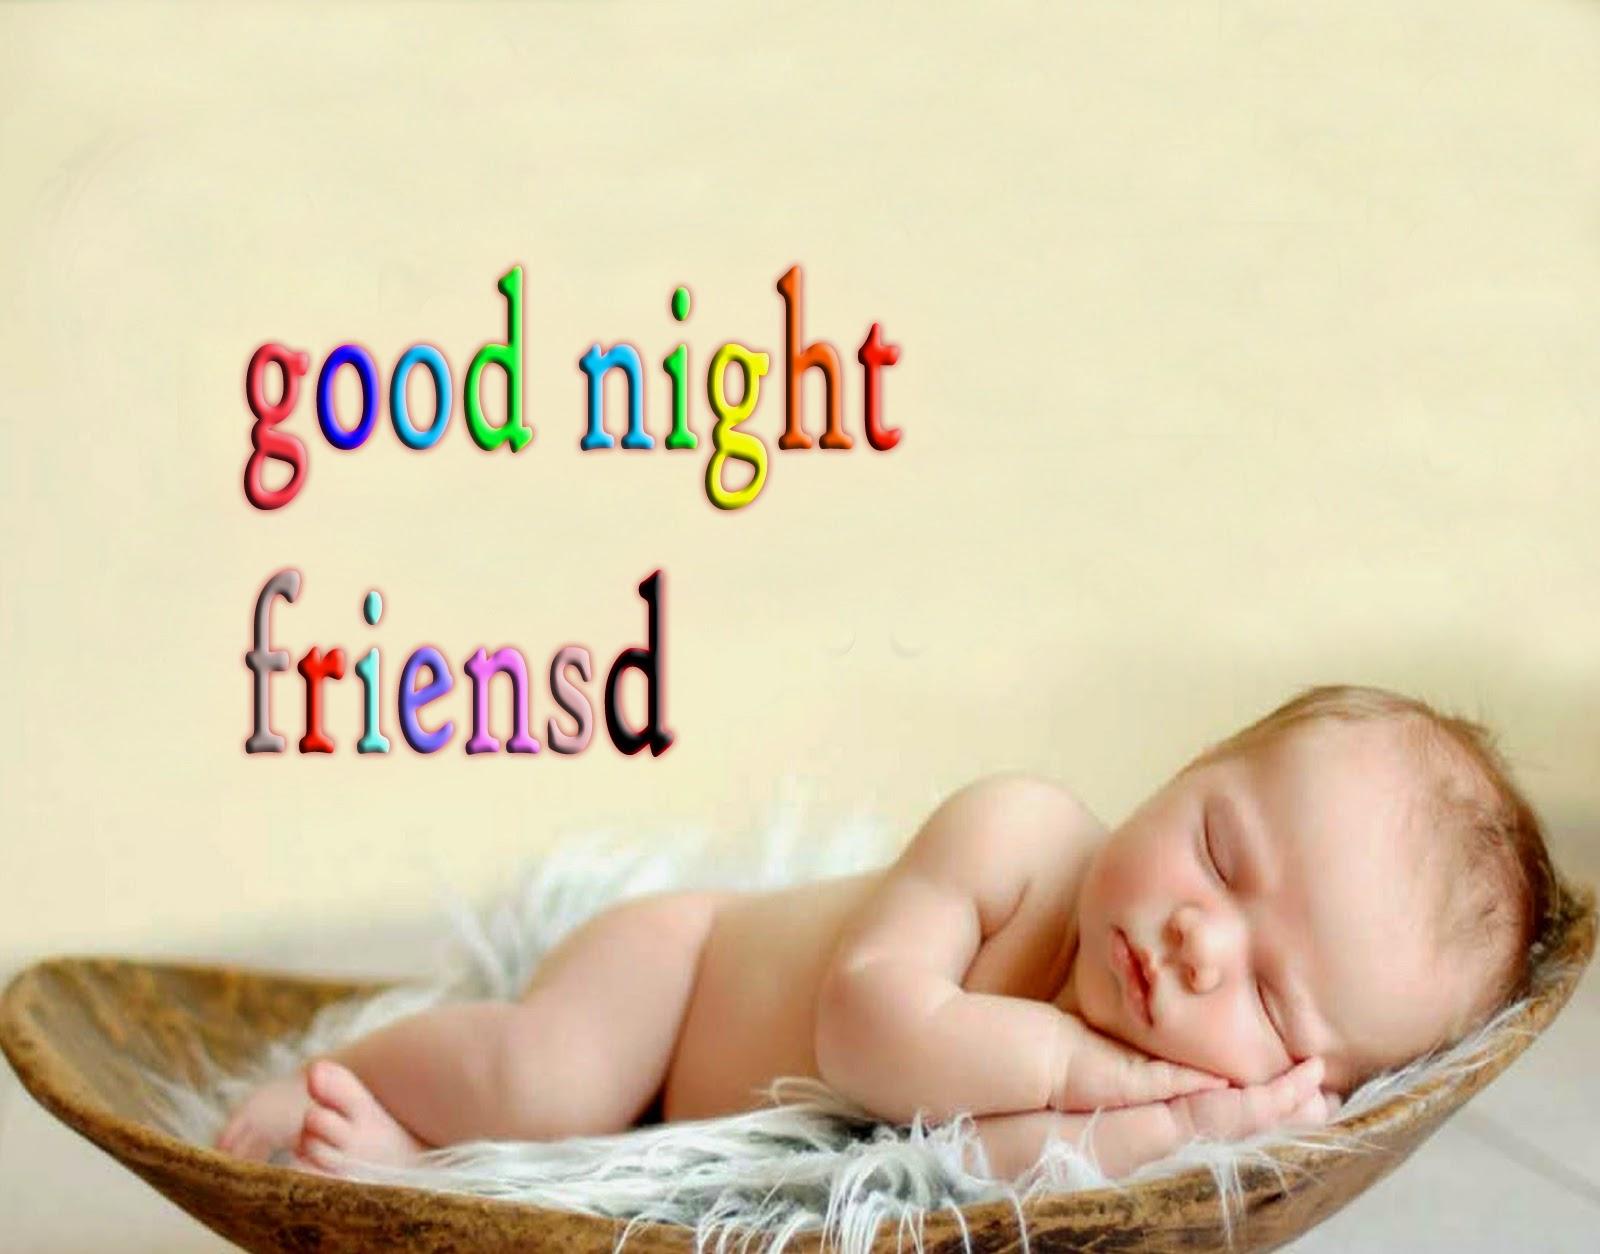 Free Hd Wallpapers Of Download Free Hd Wallpapers Download Hd Wallpapers Of Events Download Free Hd Good Night Wallpaper